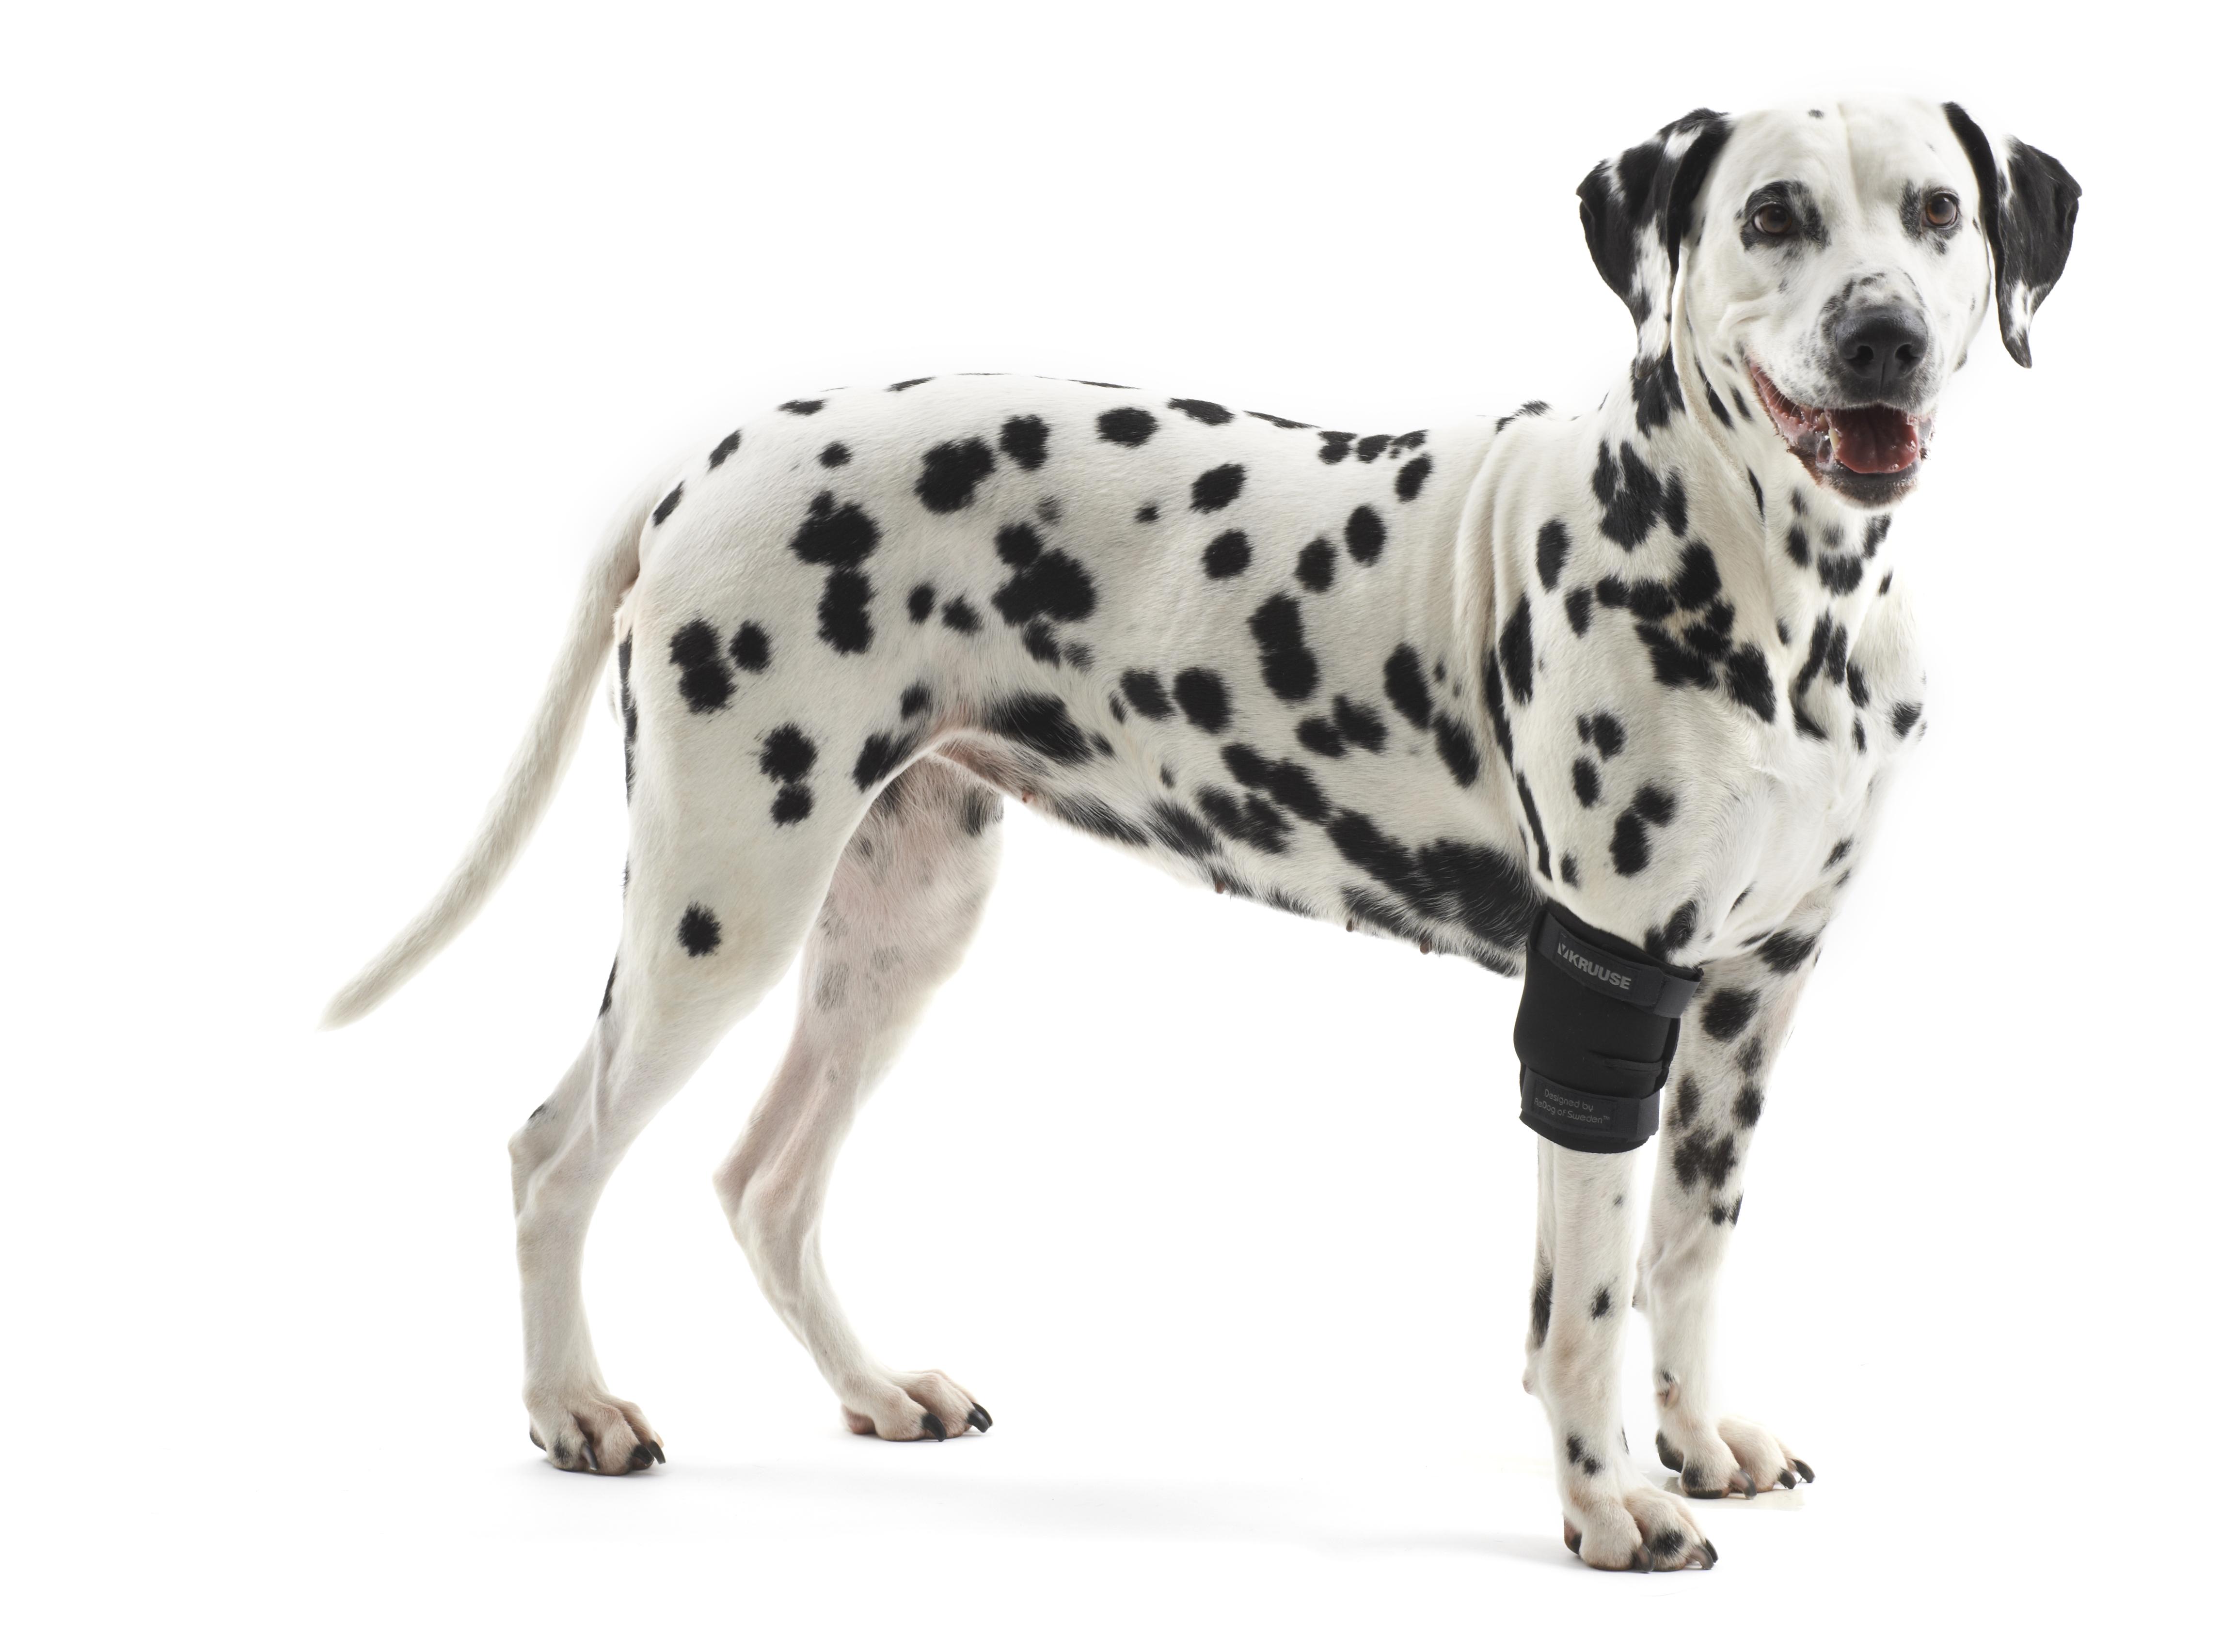 Протектор для собак Kruuse Rehab Elbow Protector